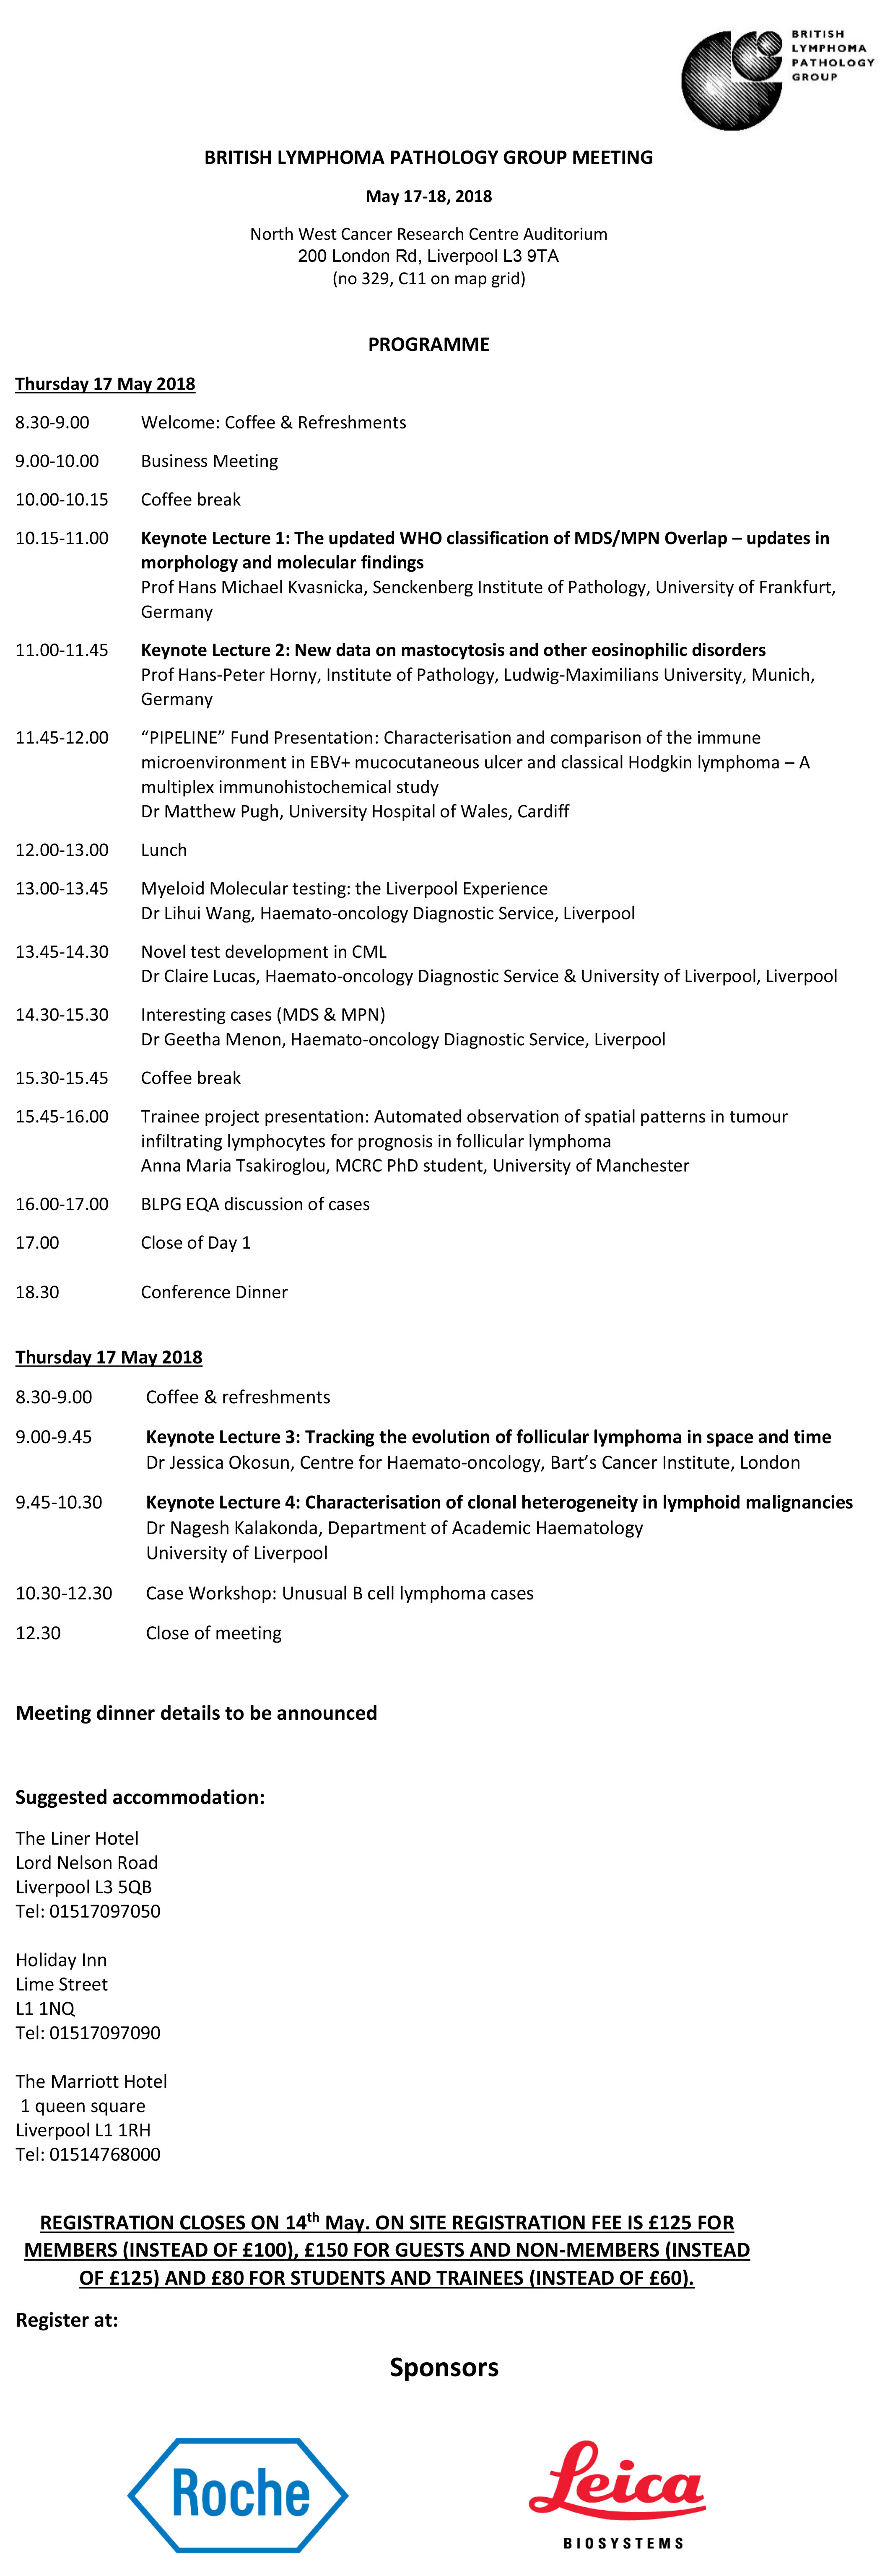 BLPG spring meeting 2018 programme